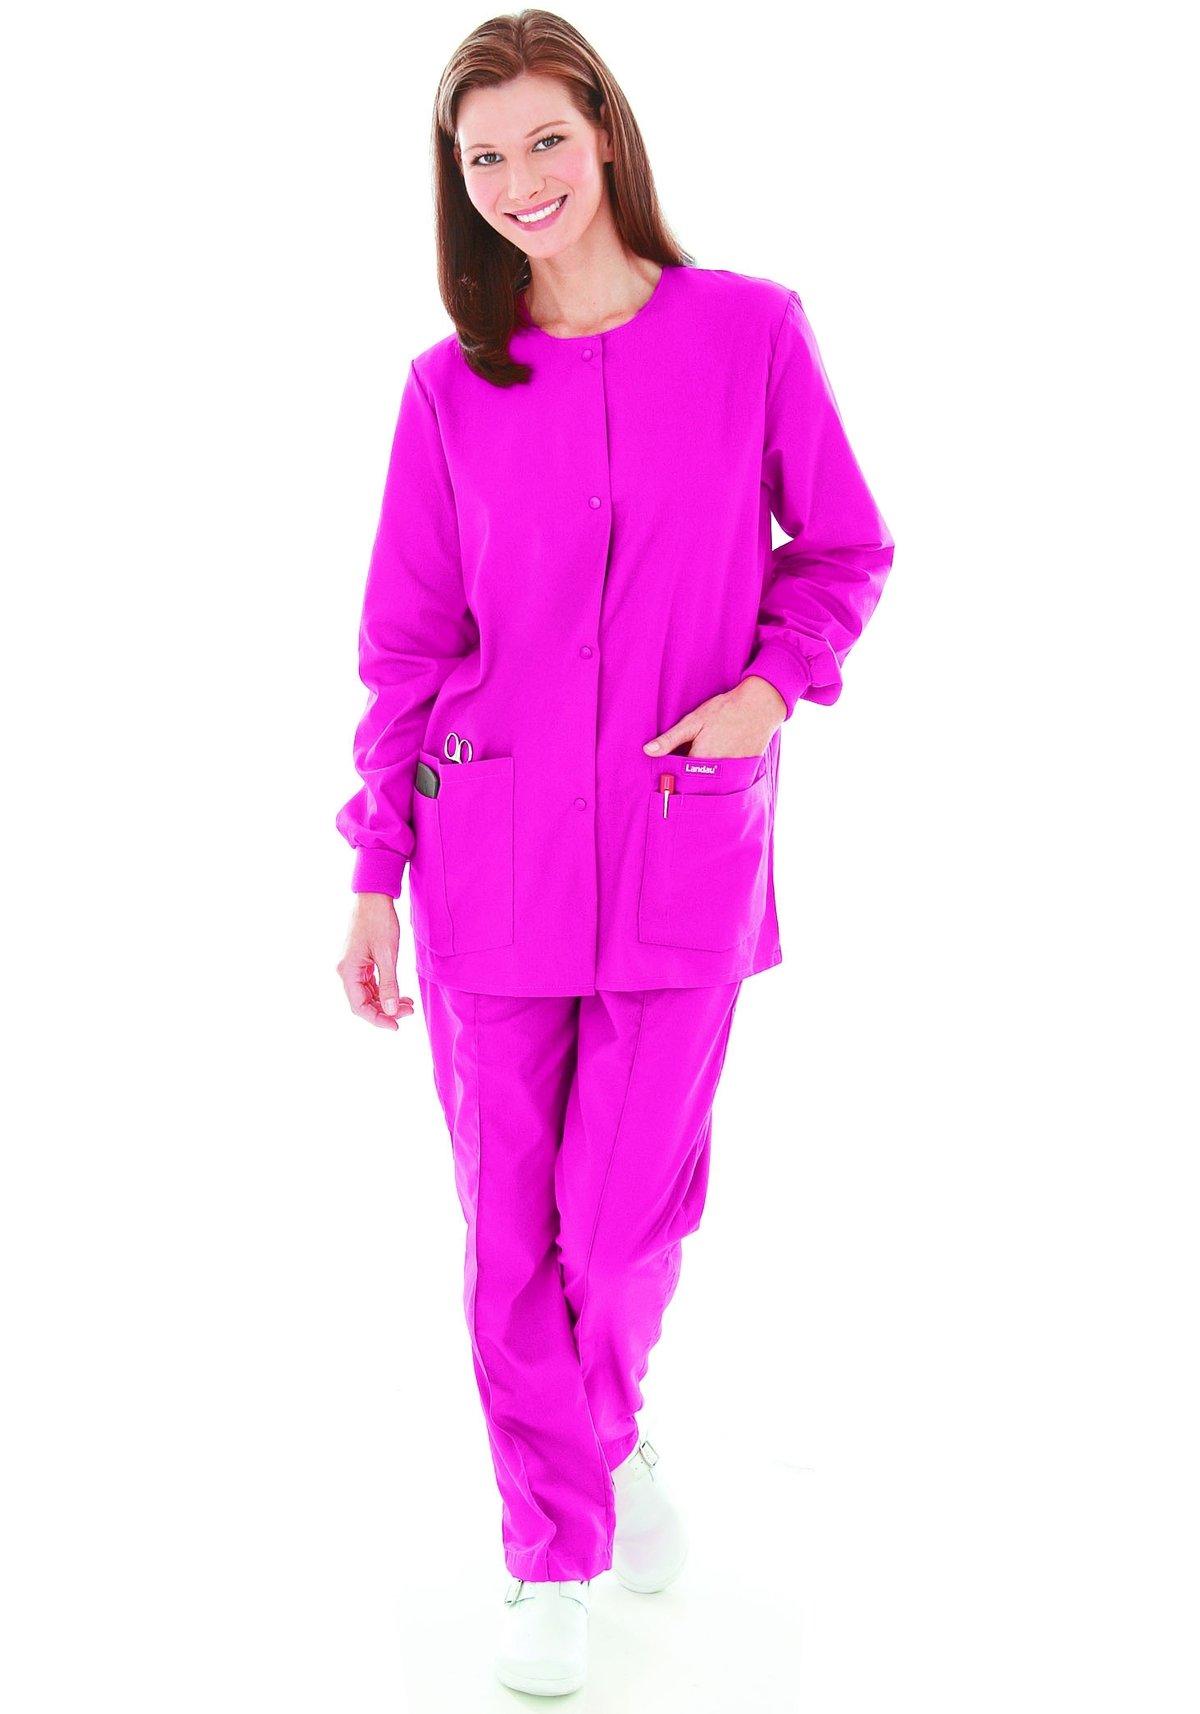 Landau 7525 Women's Warm-Up Jacket | eBay